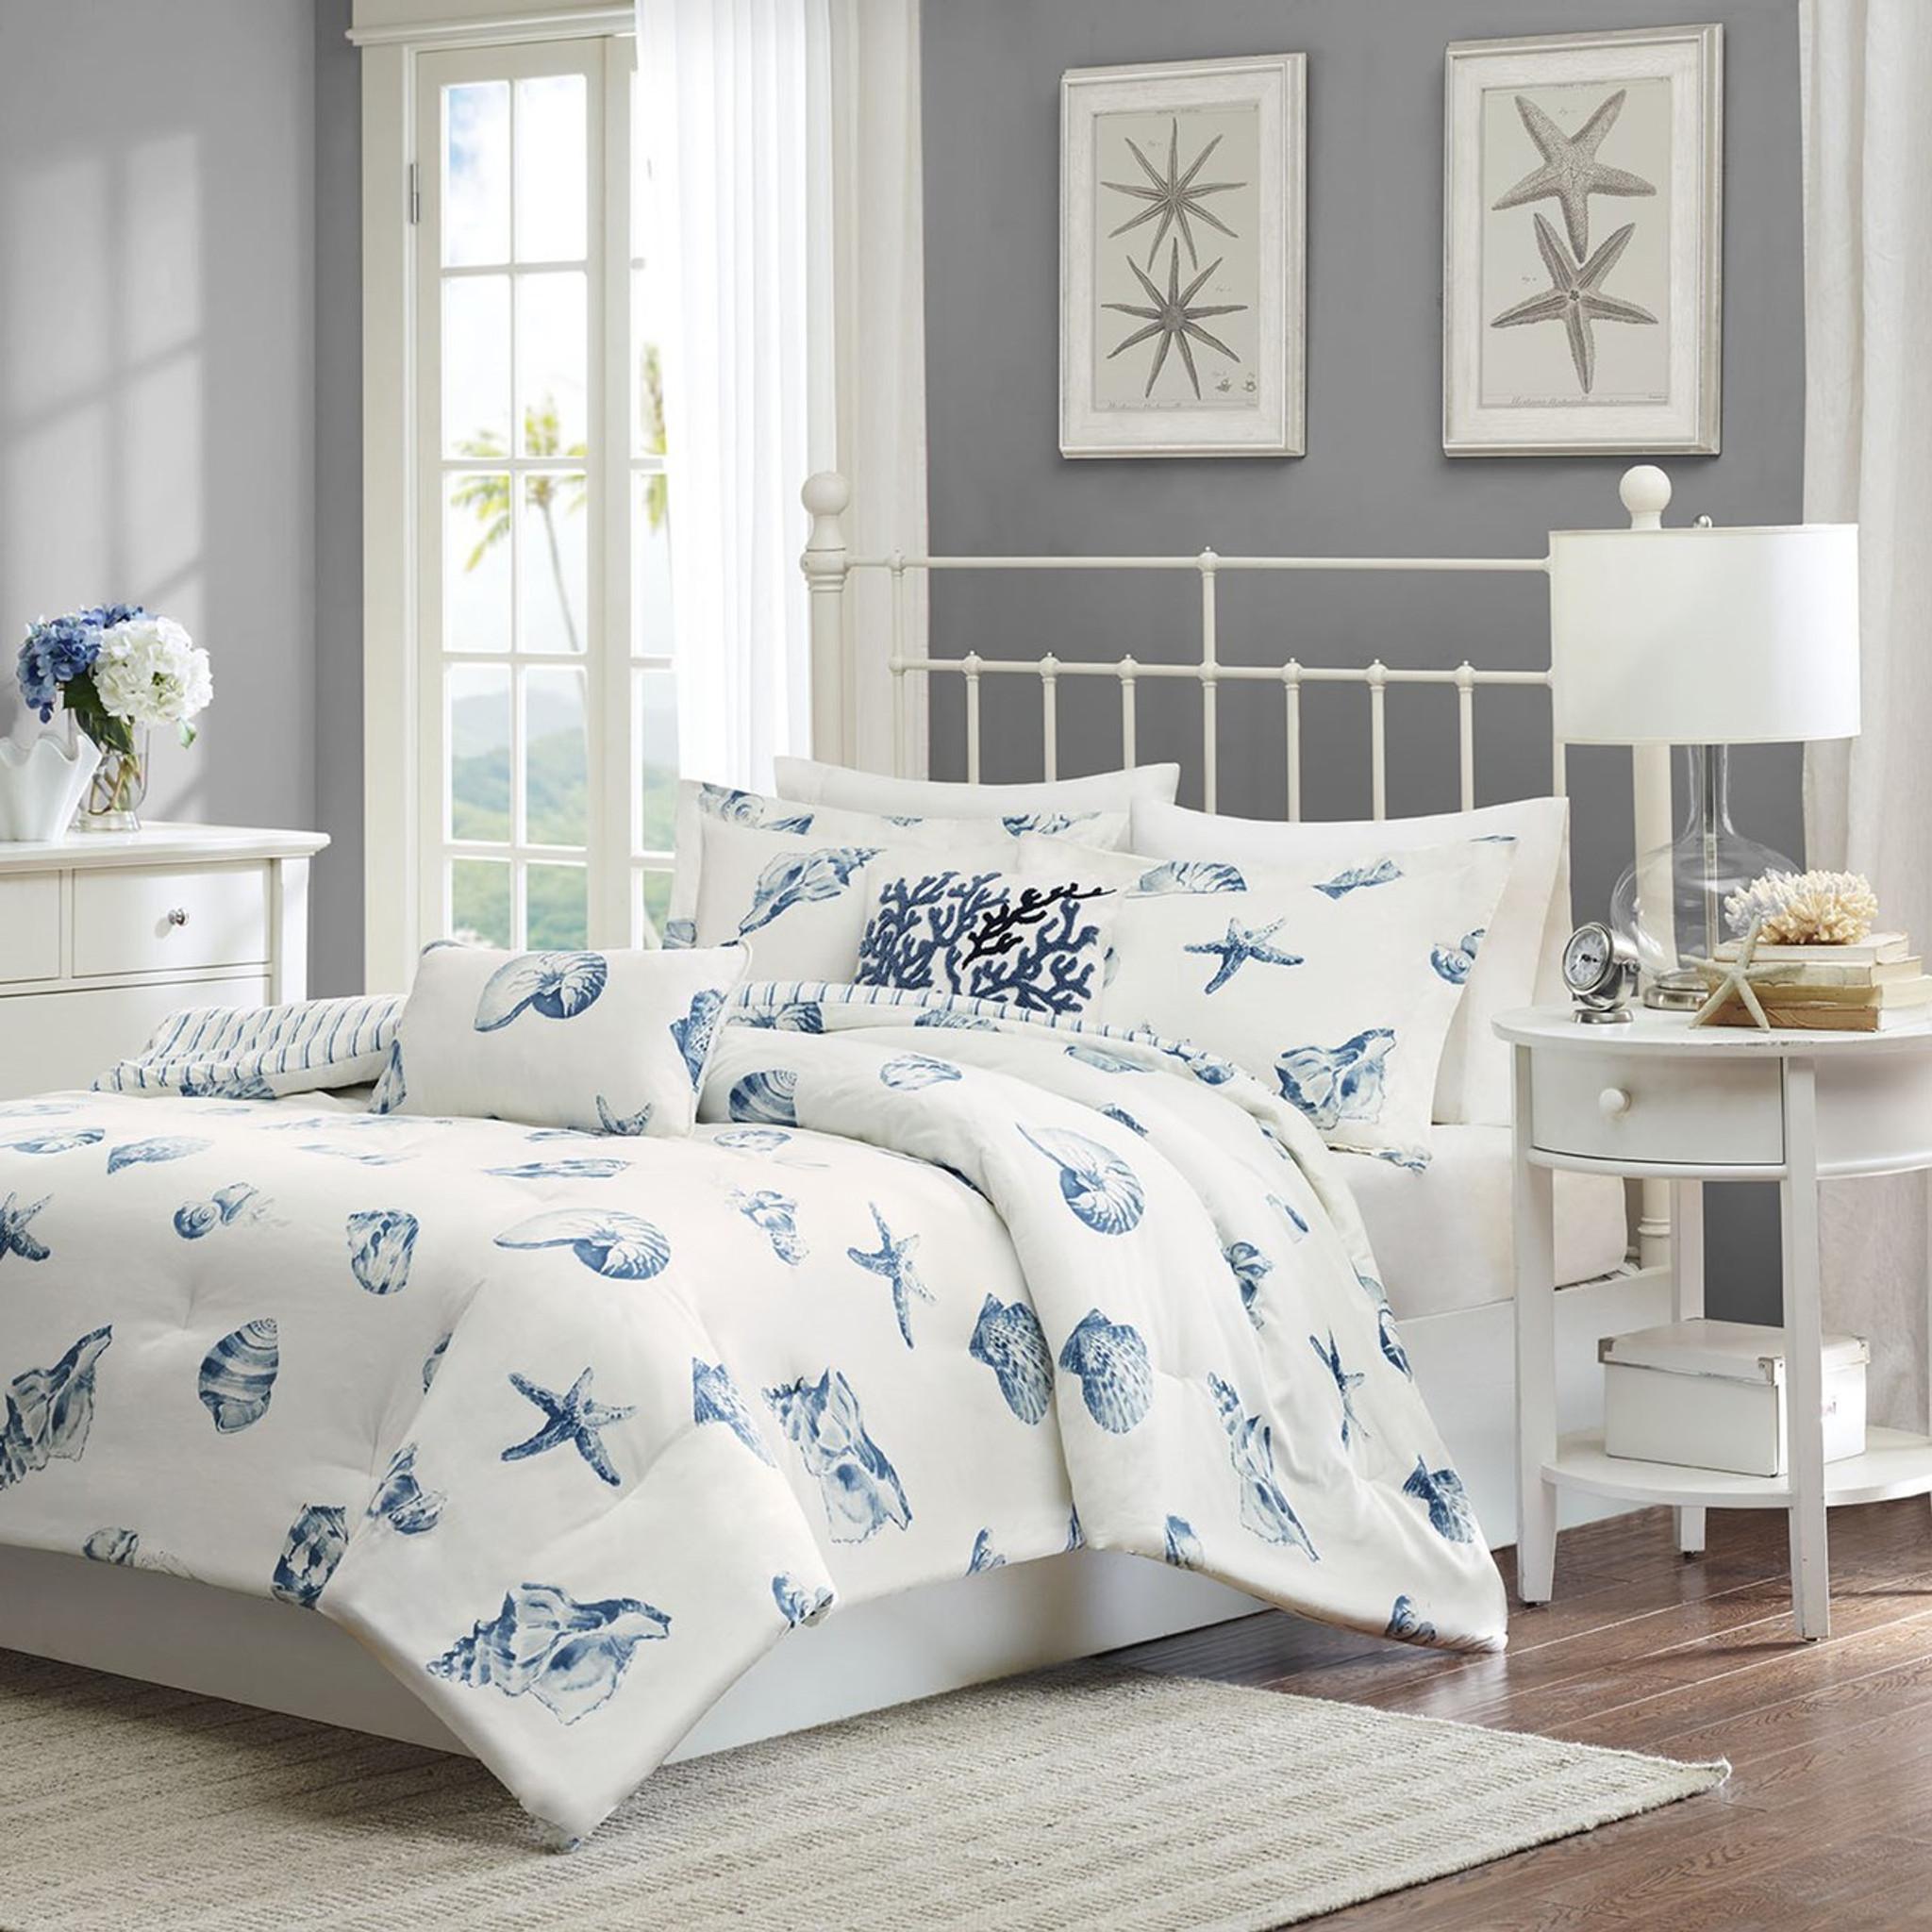 Beach House Blues Comforter Set King Size